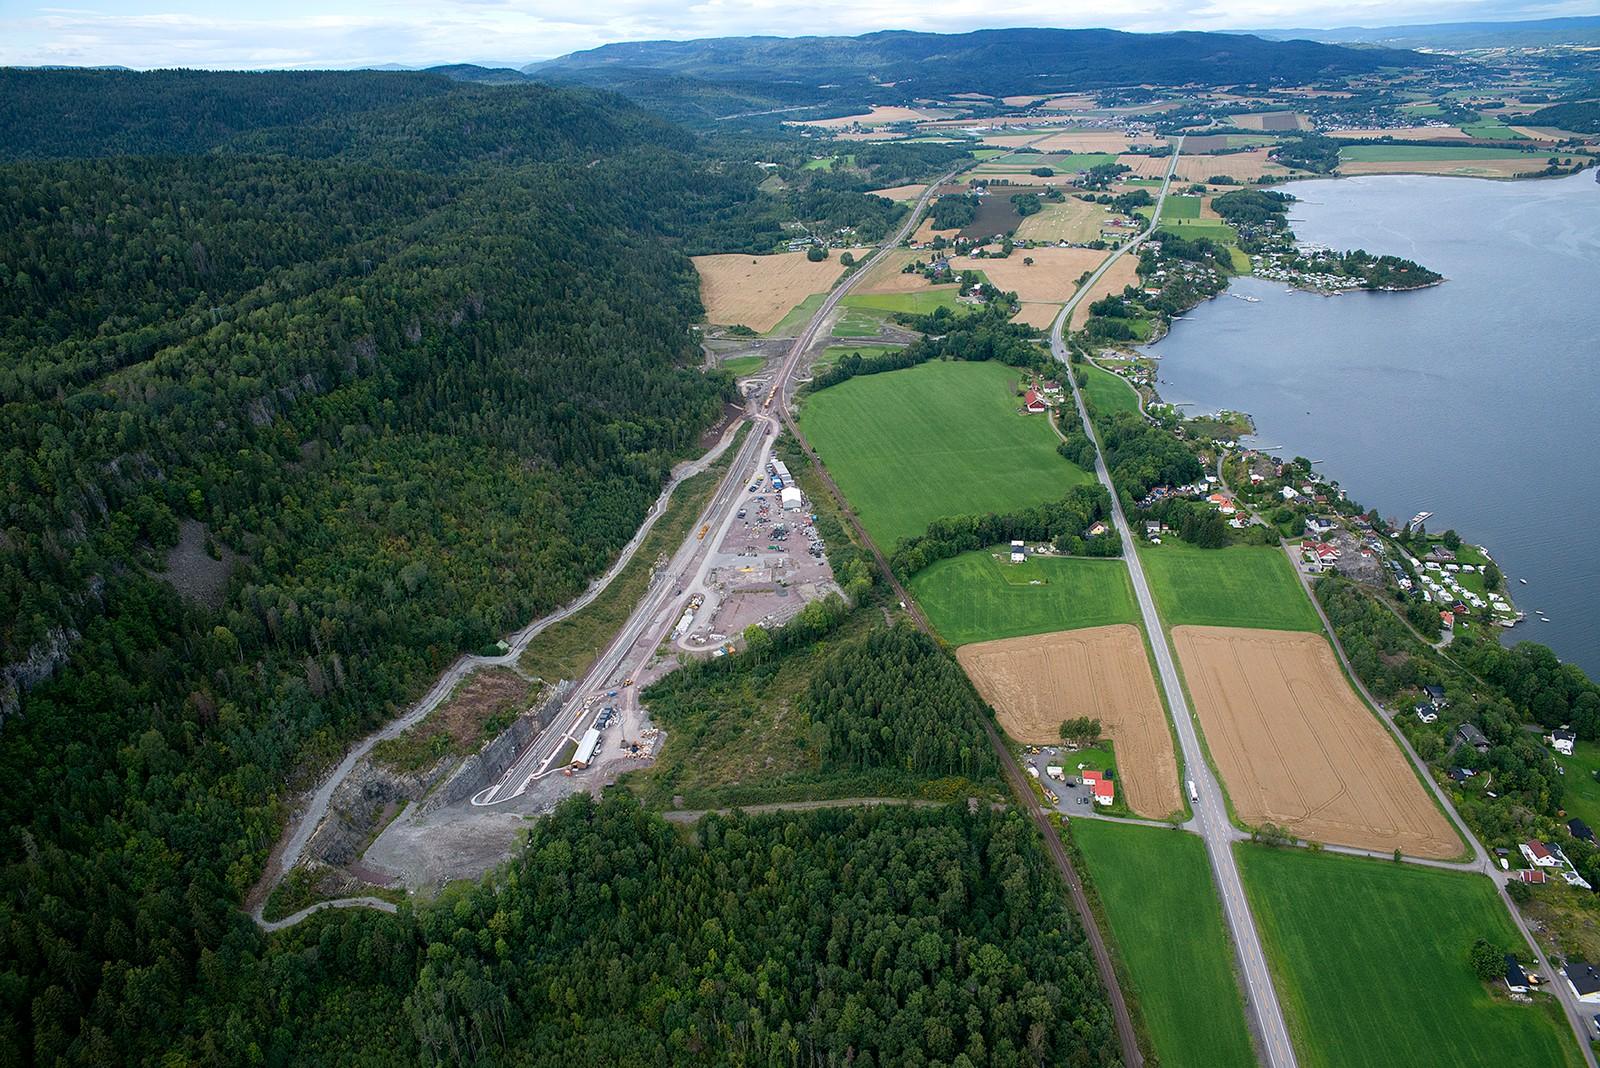 Tunnelportalen på Holm og nordover mot Sande.